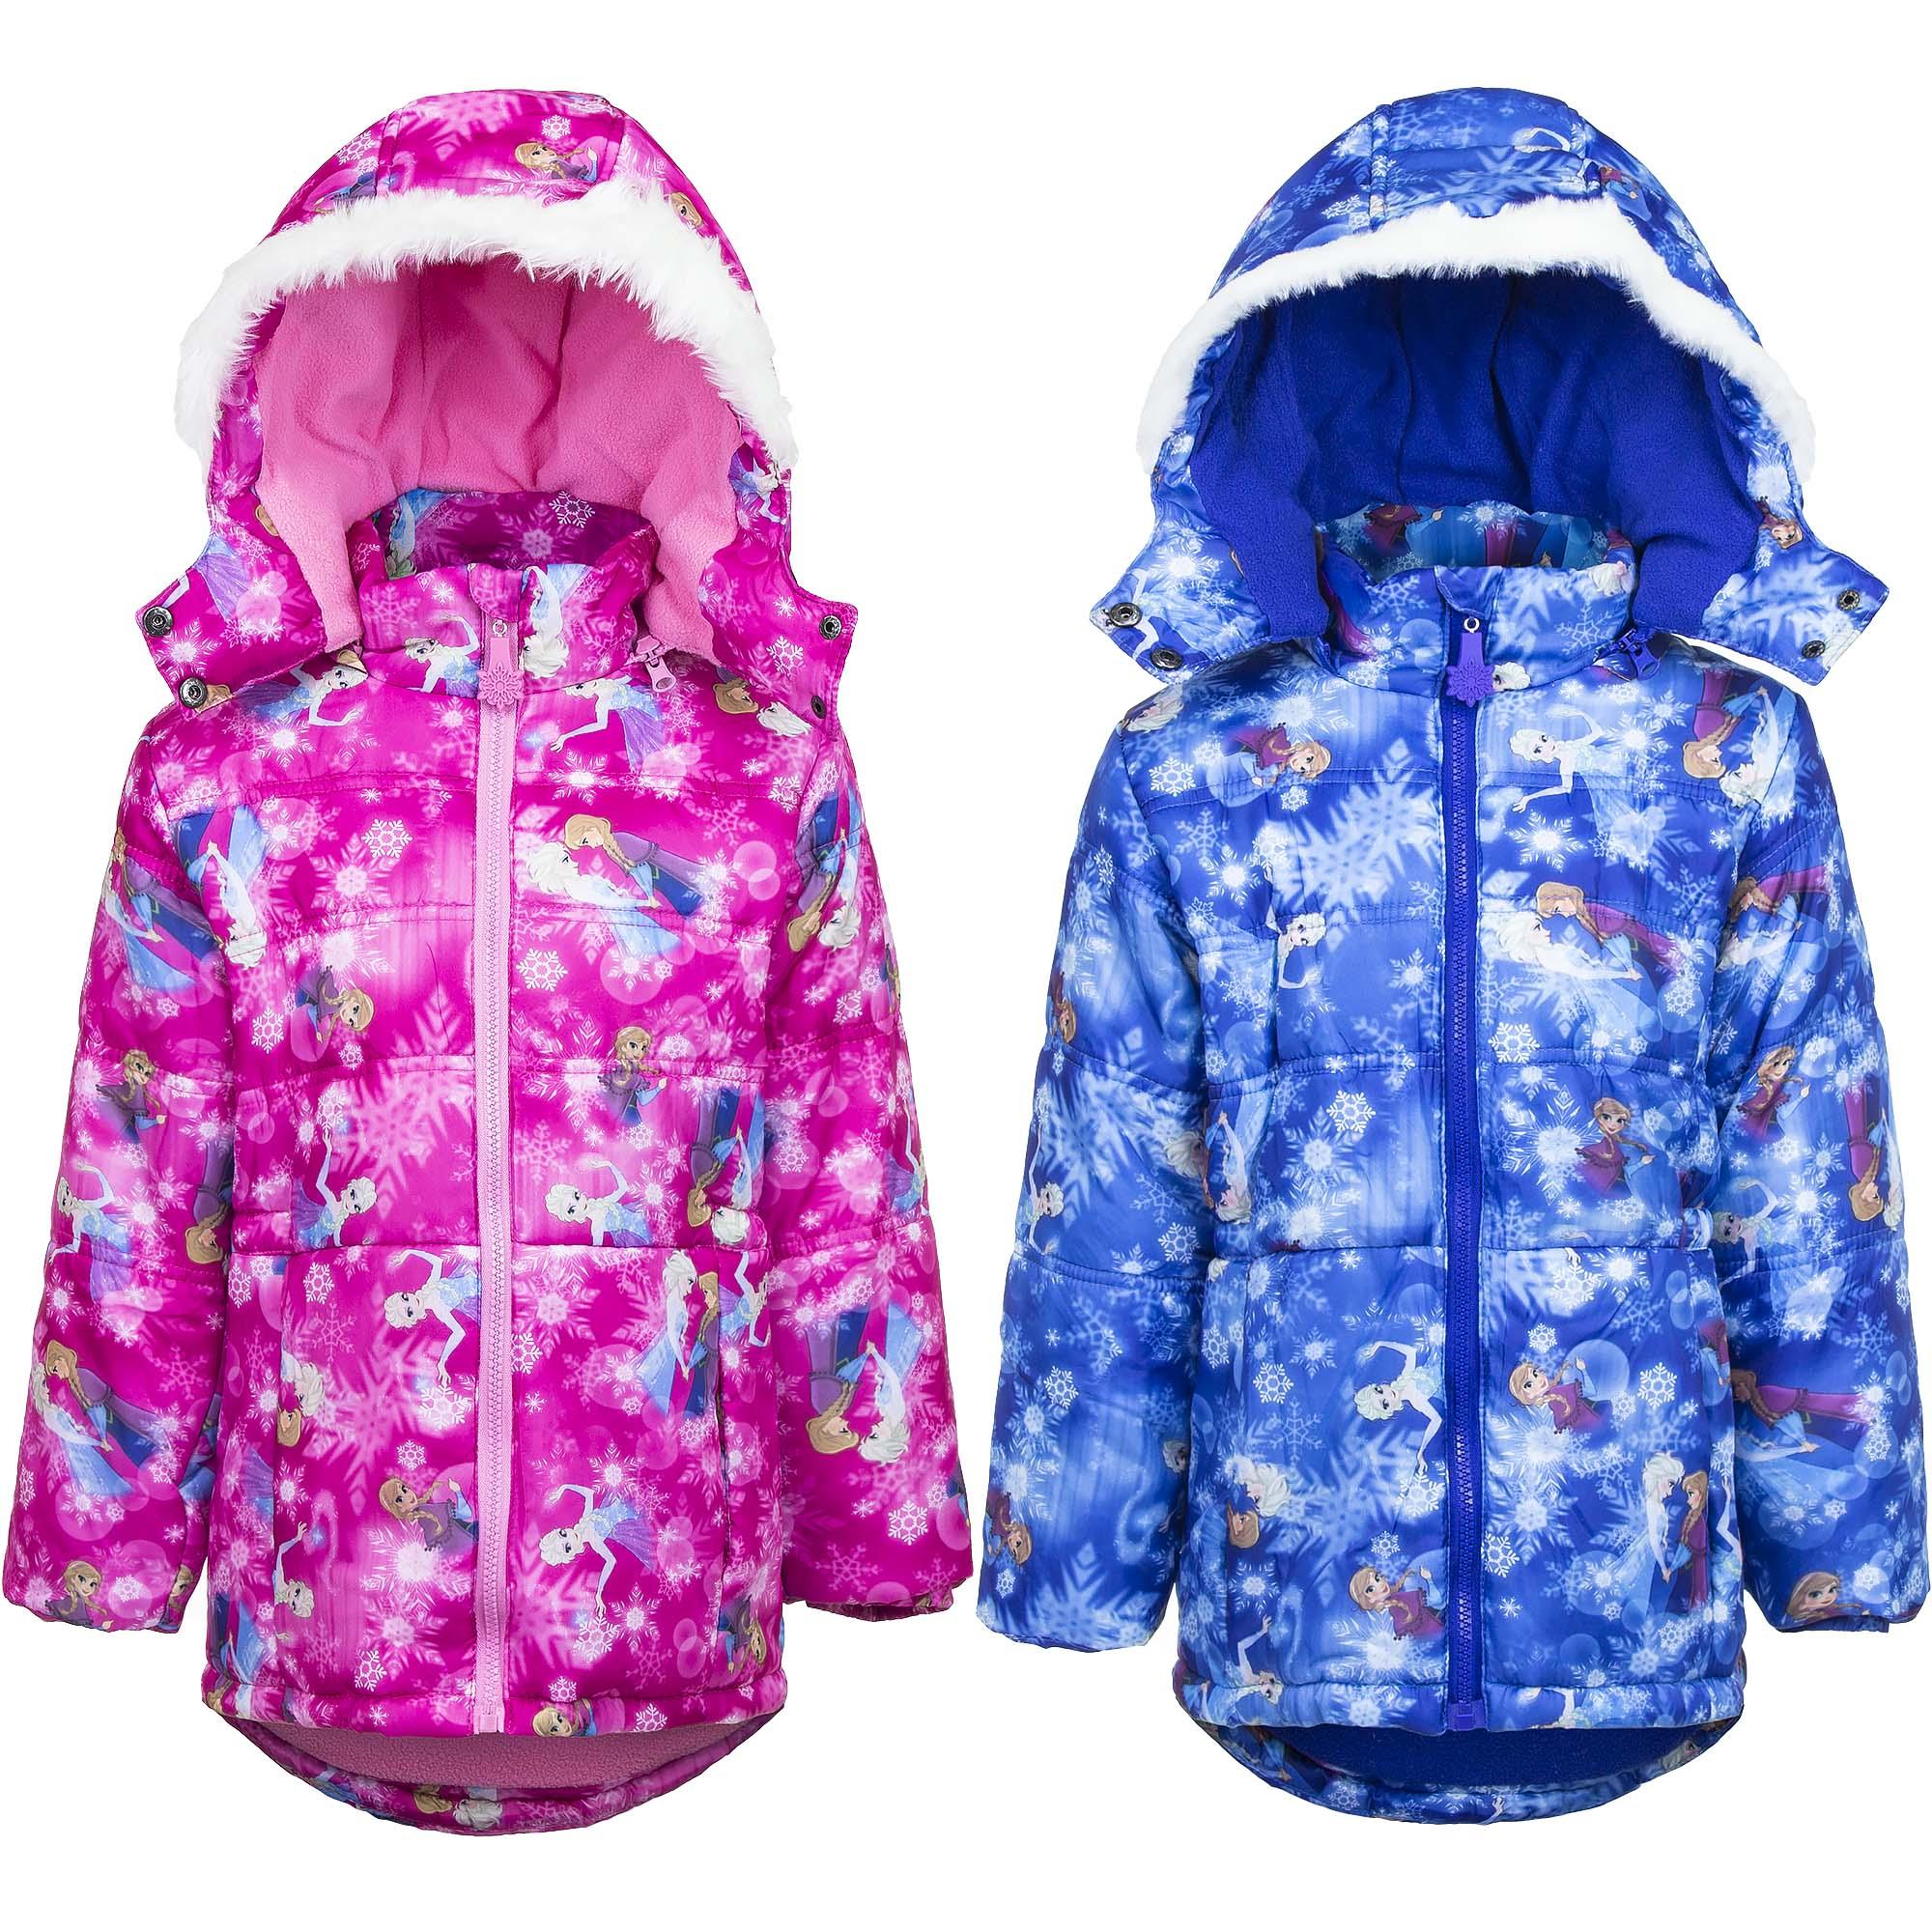 Frozen Winter Disney Jacke Jacket Mädchen mit Kapuze Parka Mantel 4-8 Jahre